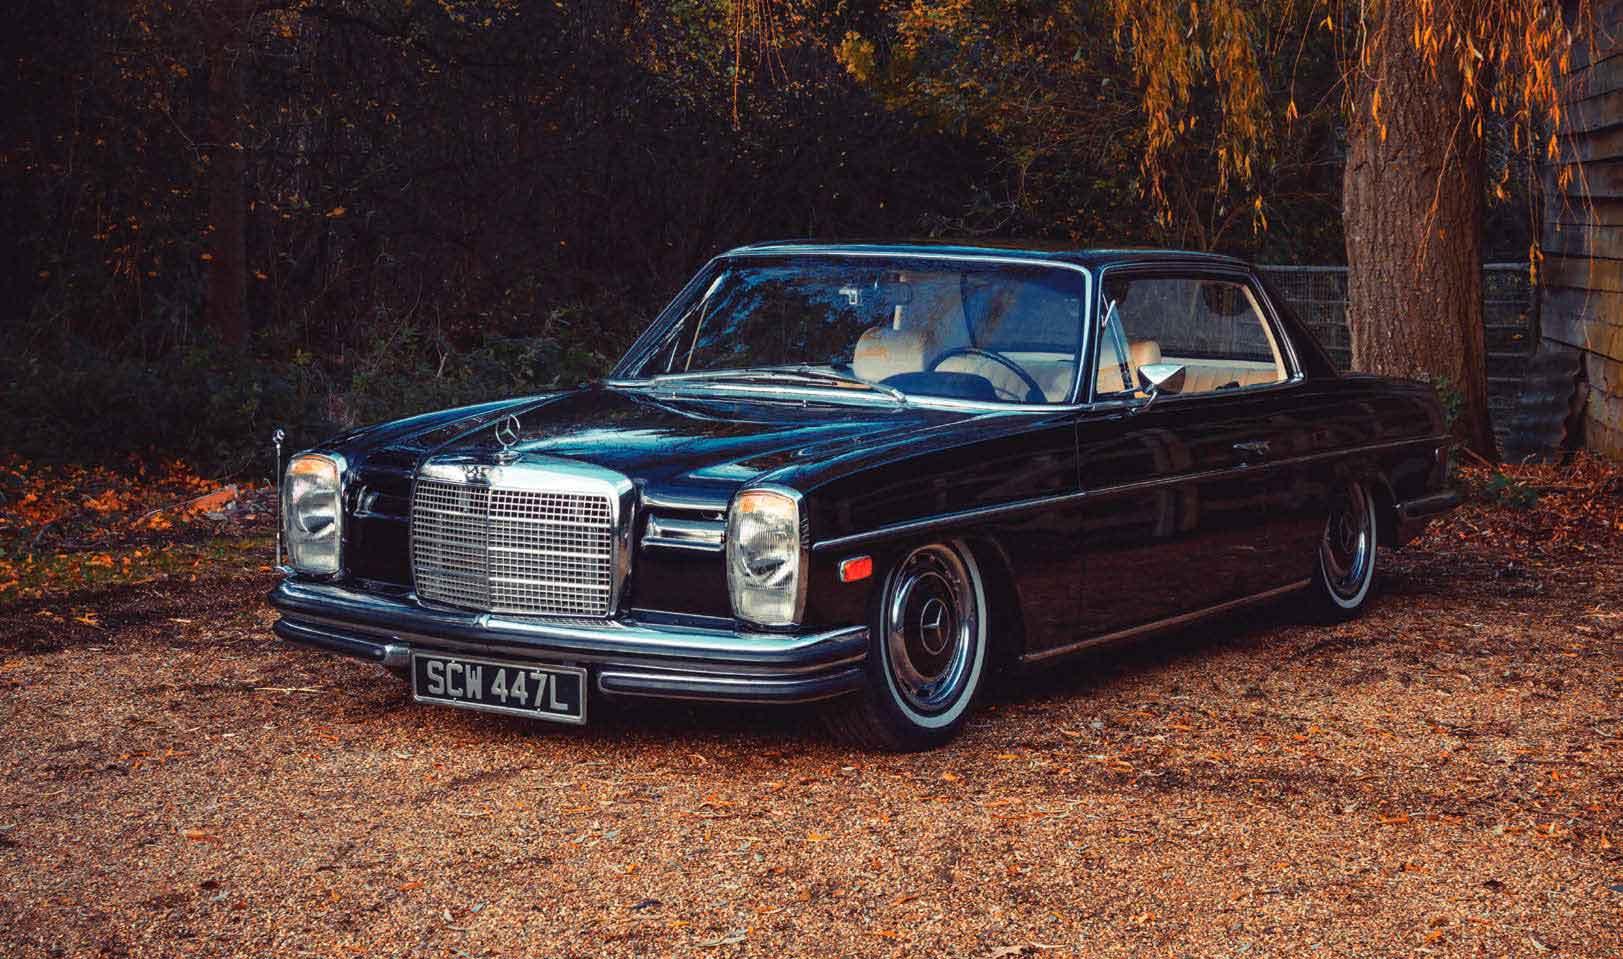 Tuned 1973 Mercedes-Benz 280CE W114/C114 Turbo Diesel OM606